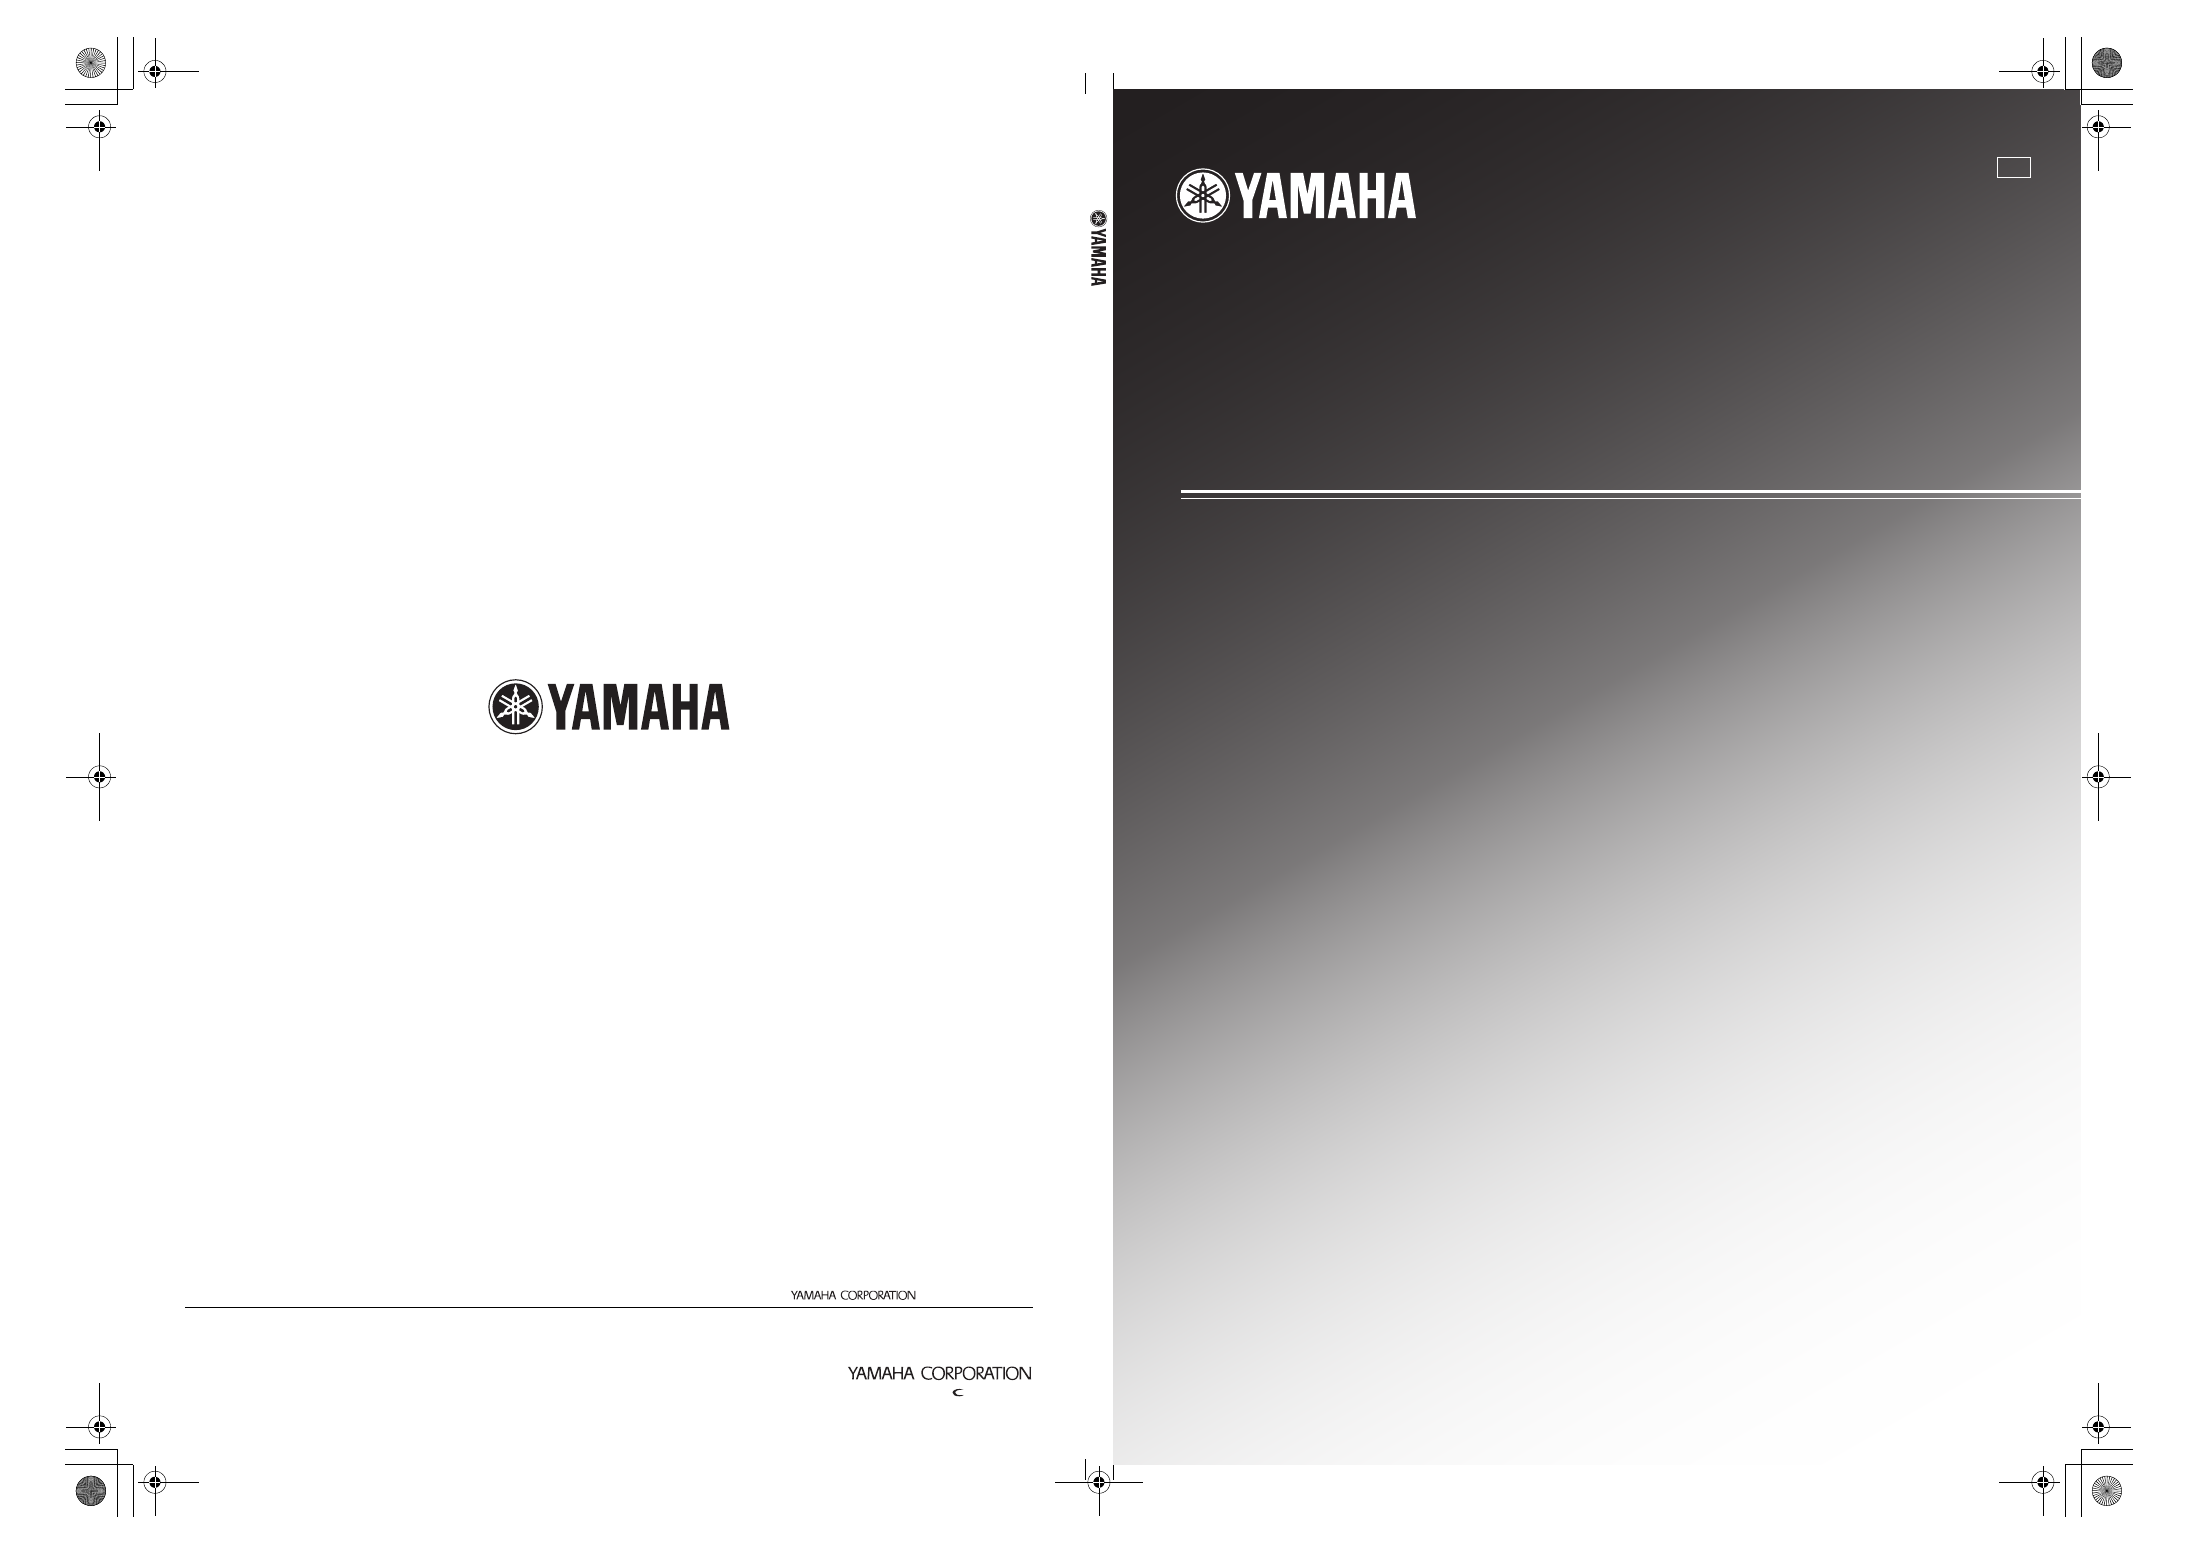 Yamaha v359 6